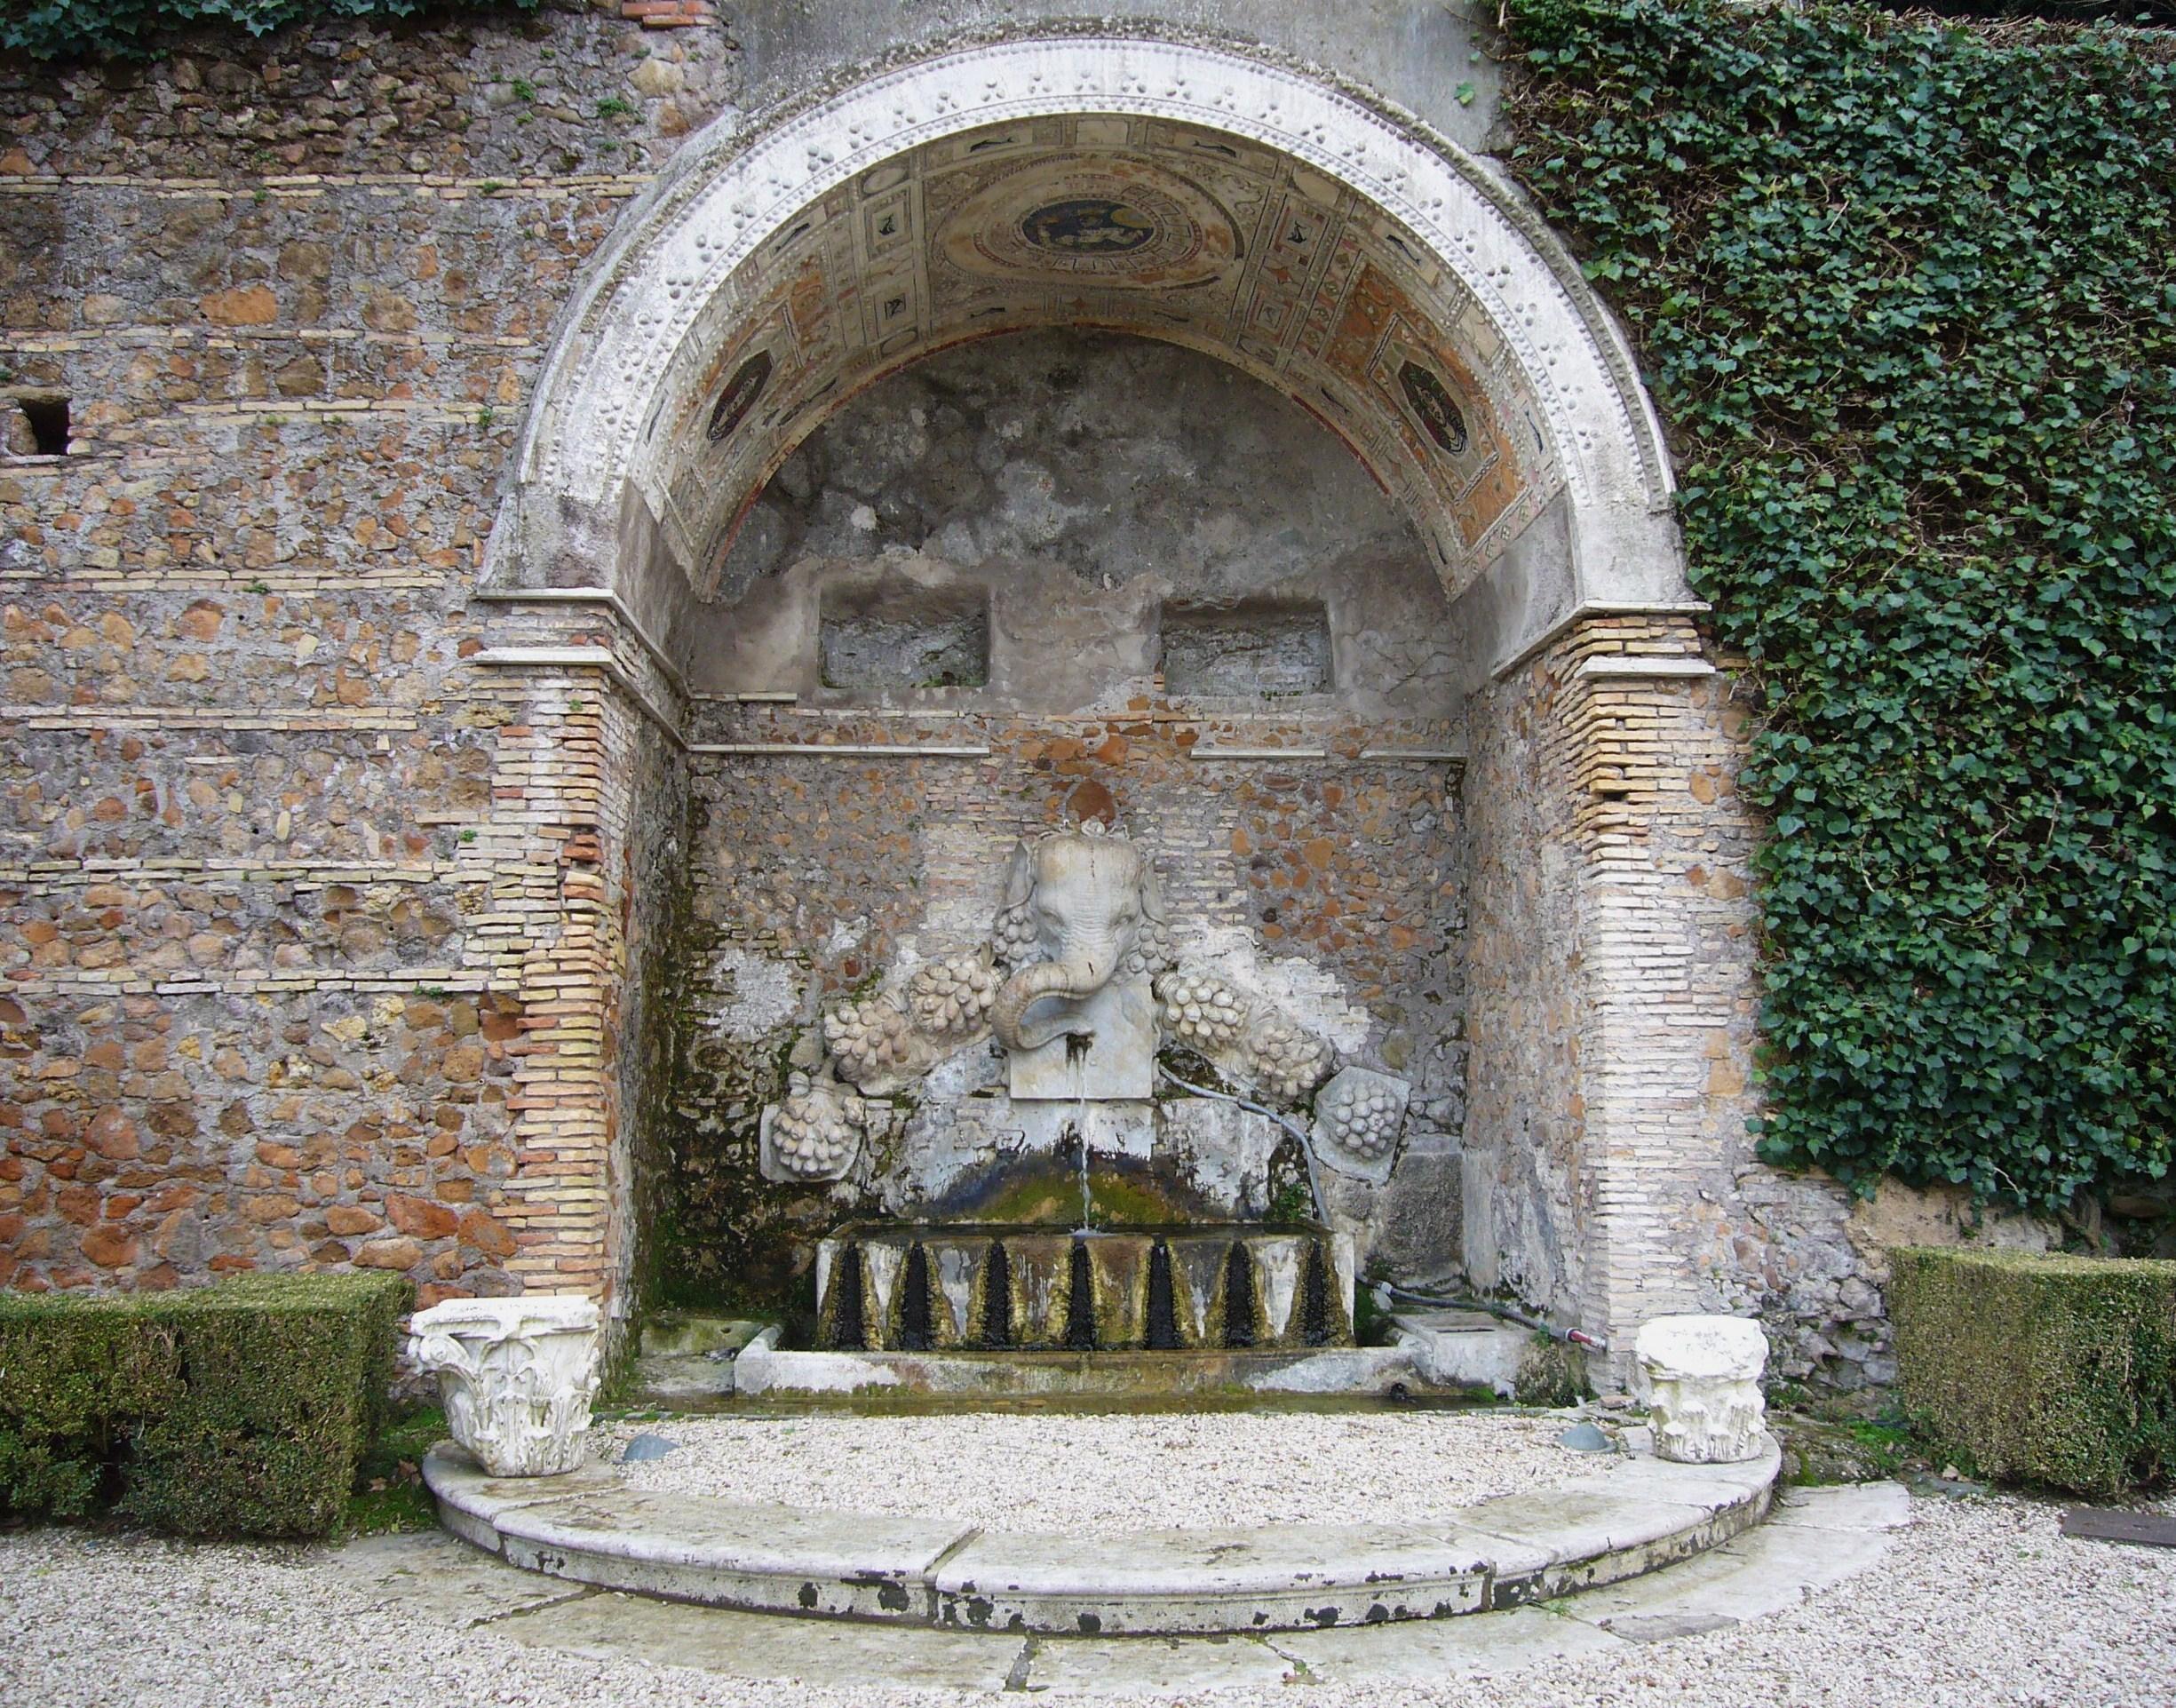 Raffaello sanzio villa madama thinglink - Fontane da giardino roma ...